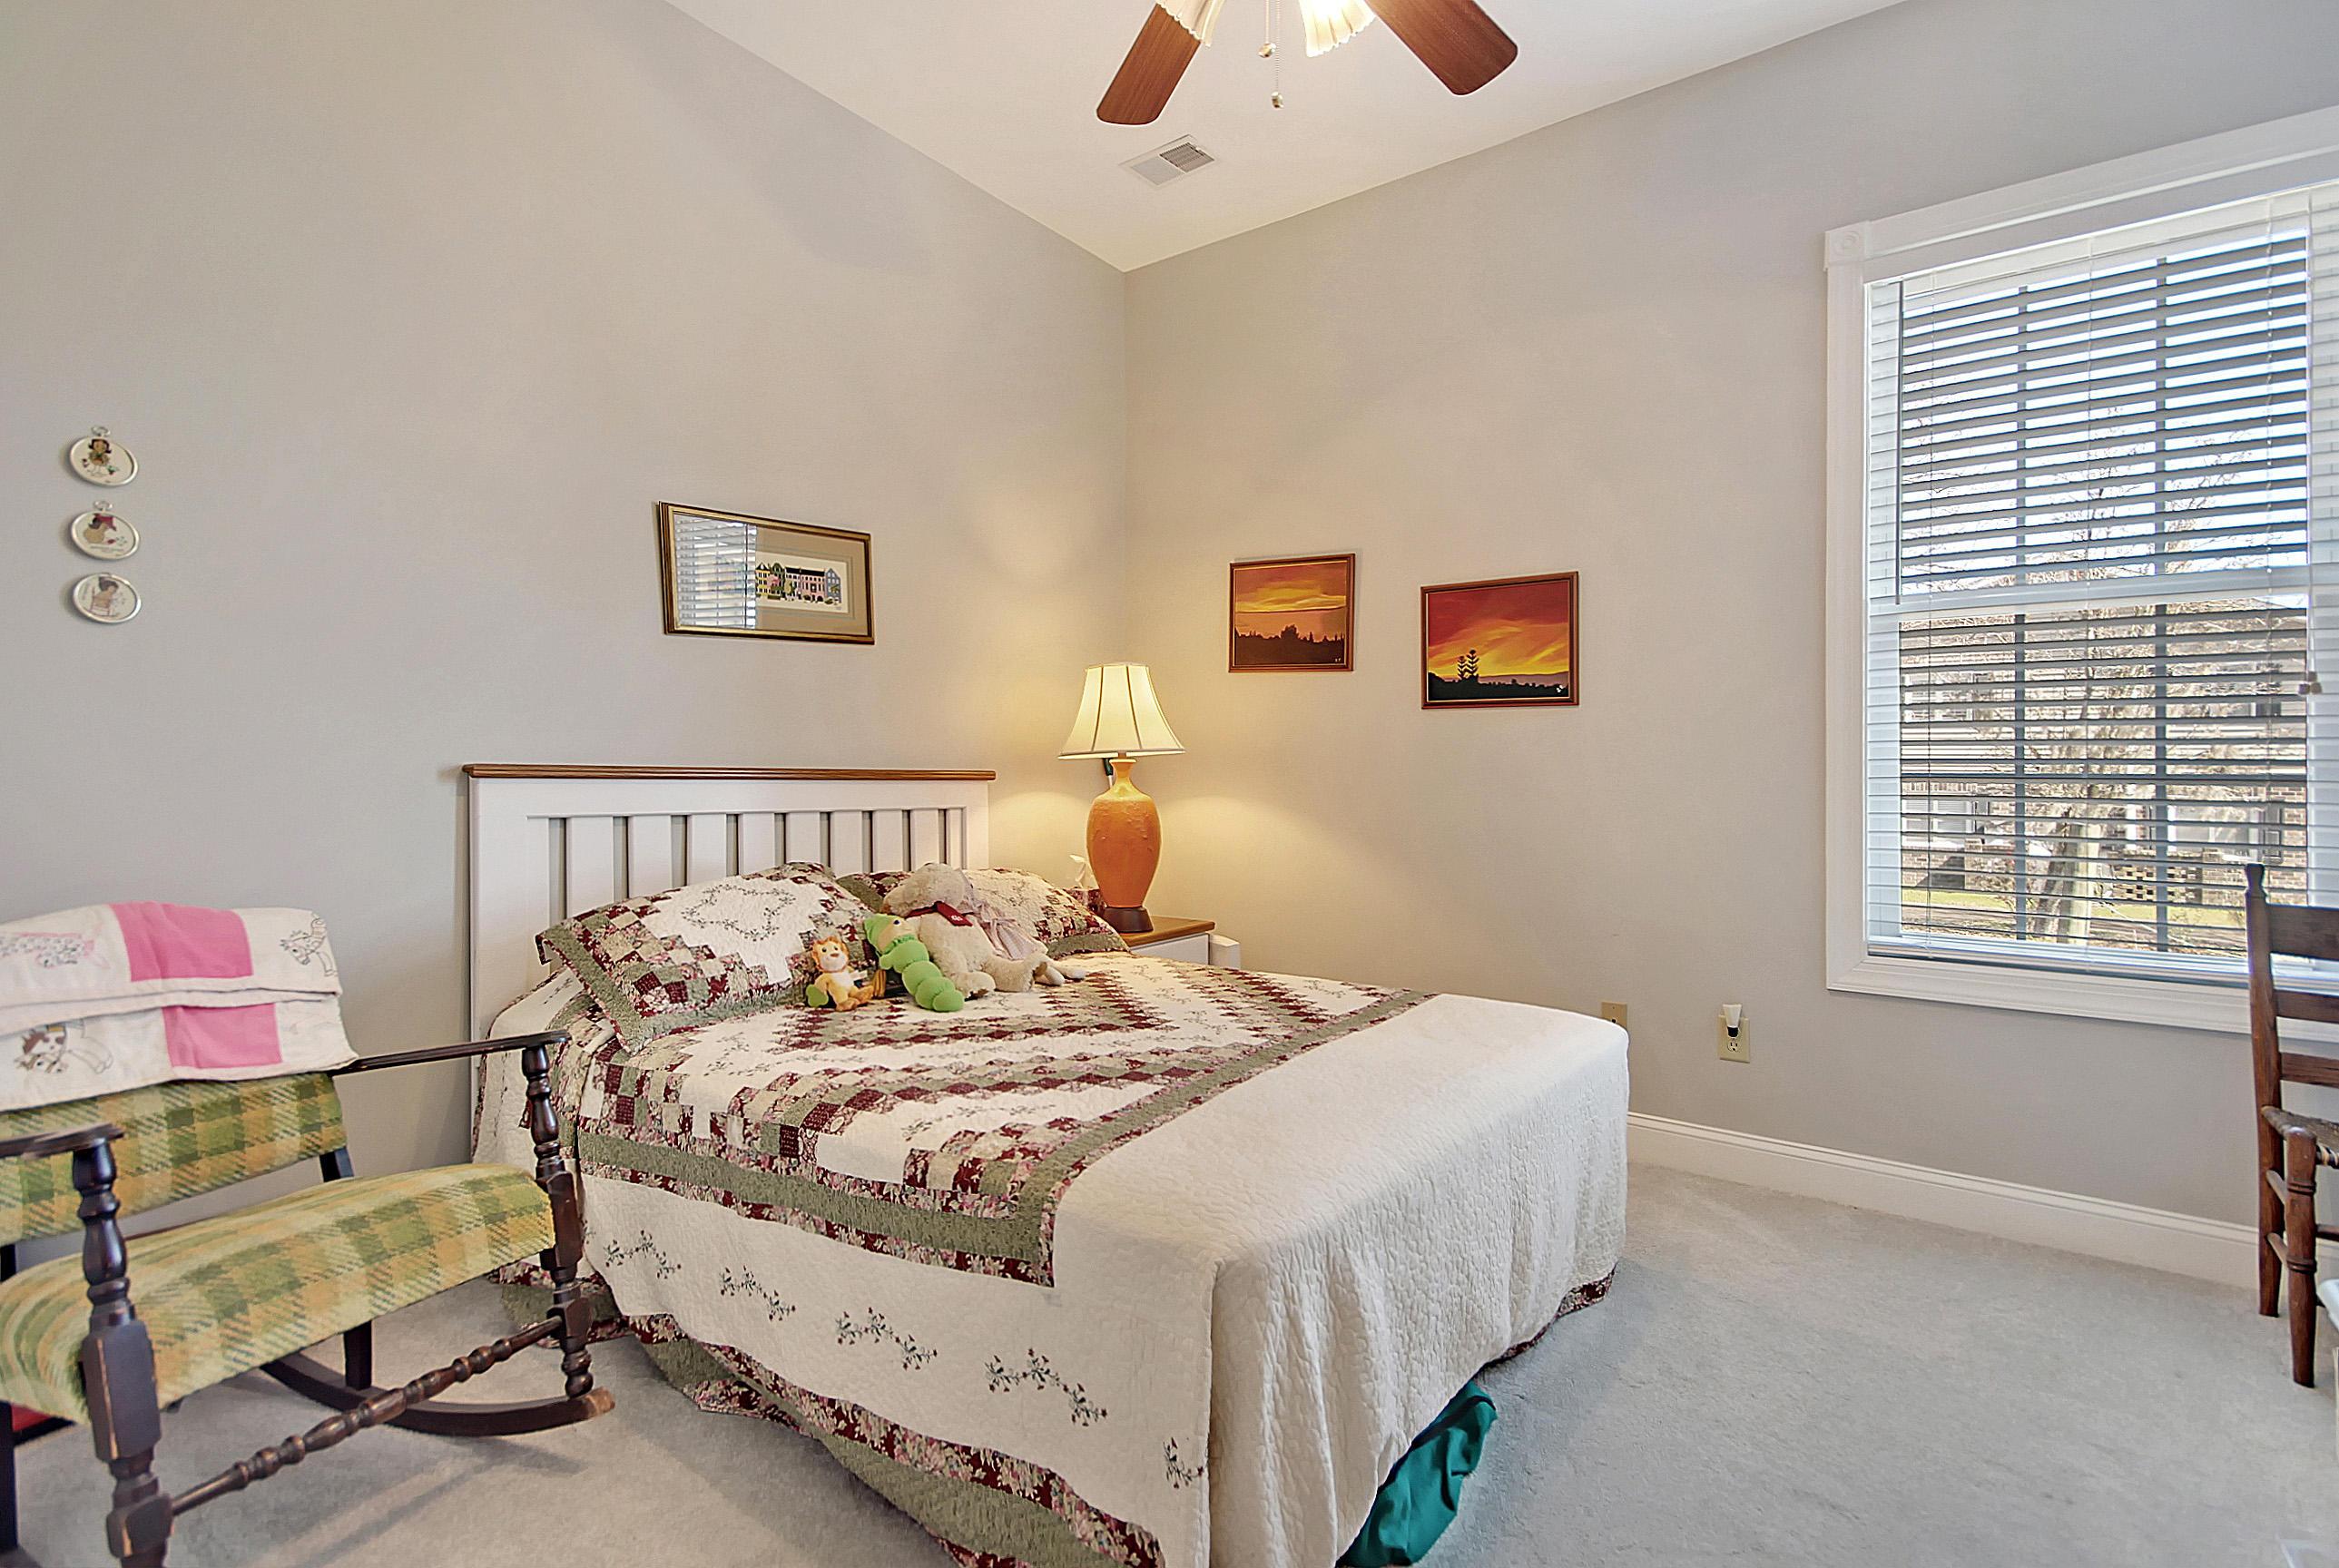 Cross Subd (Longpoint) Homes For Sale - 1191 Longpoint, Cross, SC - 23